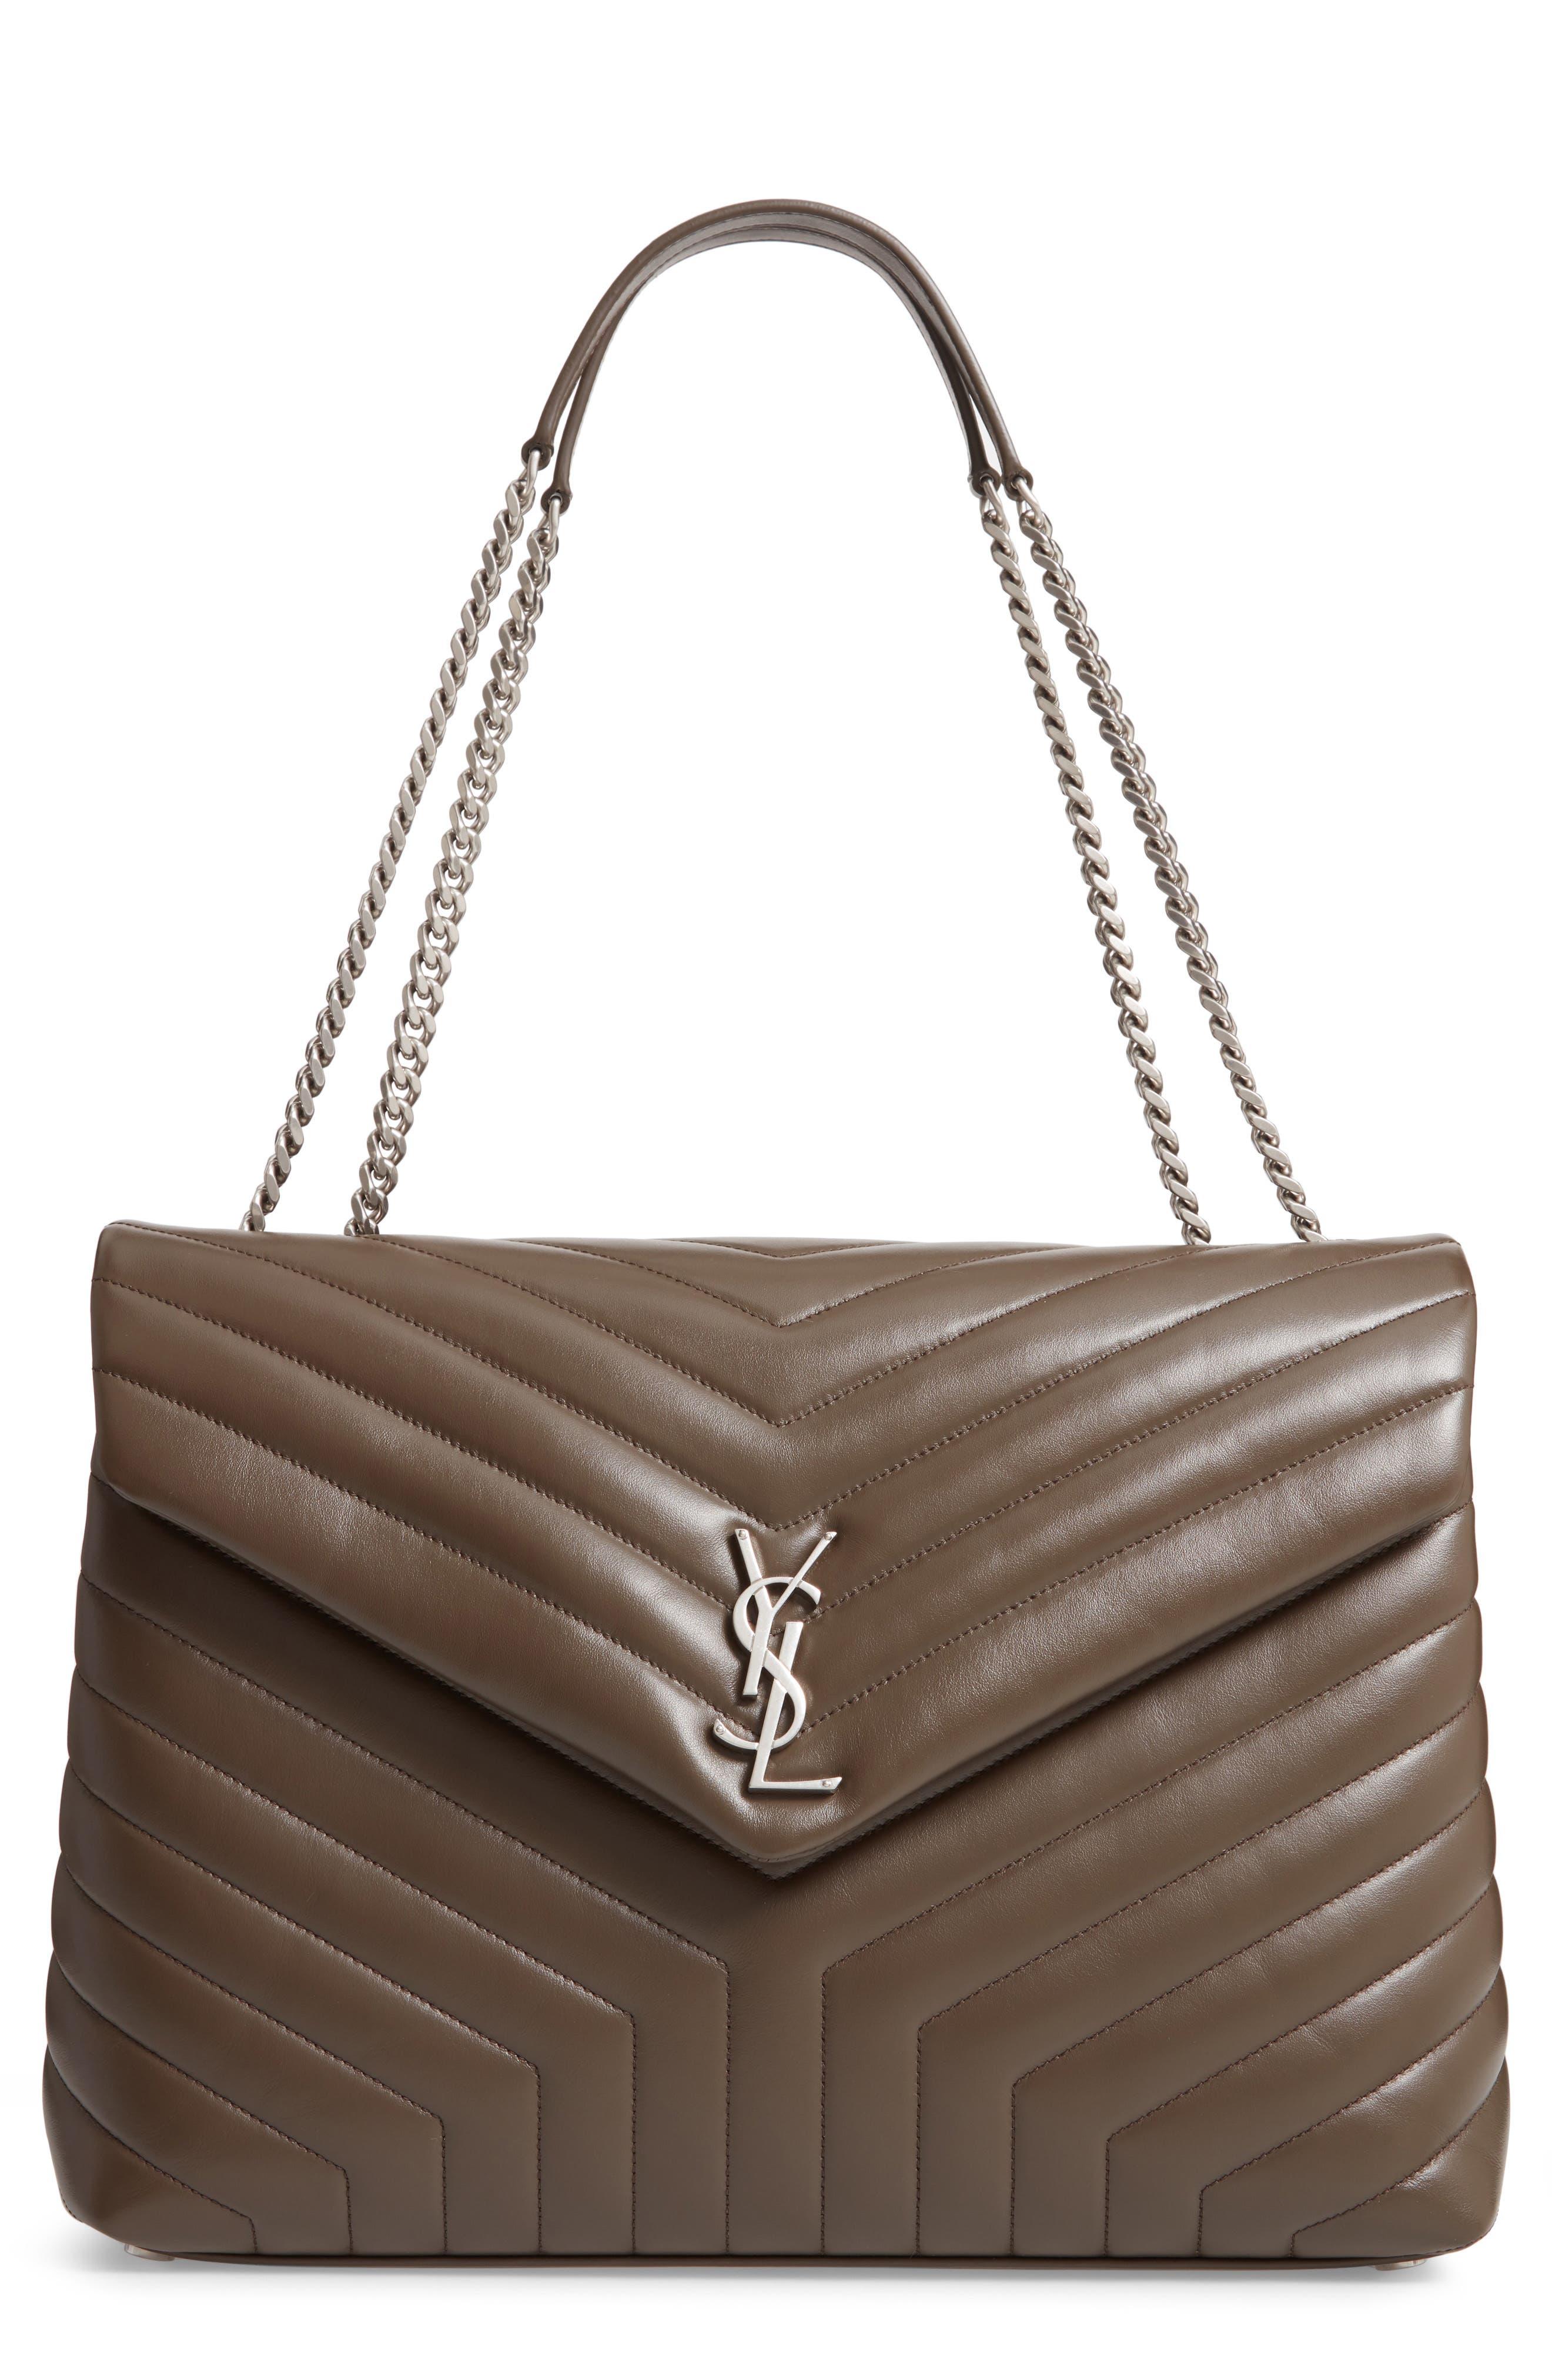 Ysl Nordstrom Ysl Handbags Nordstrom Ysl Handbags Nordstrom Handbags qwg4dq